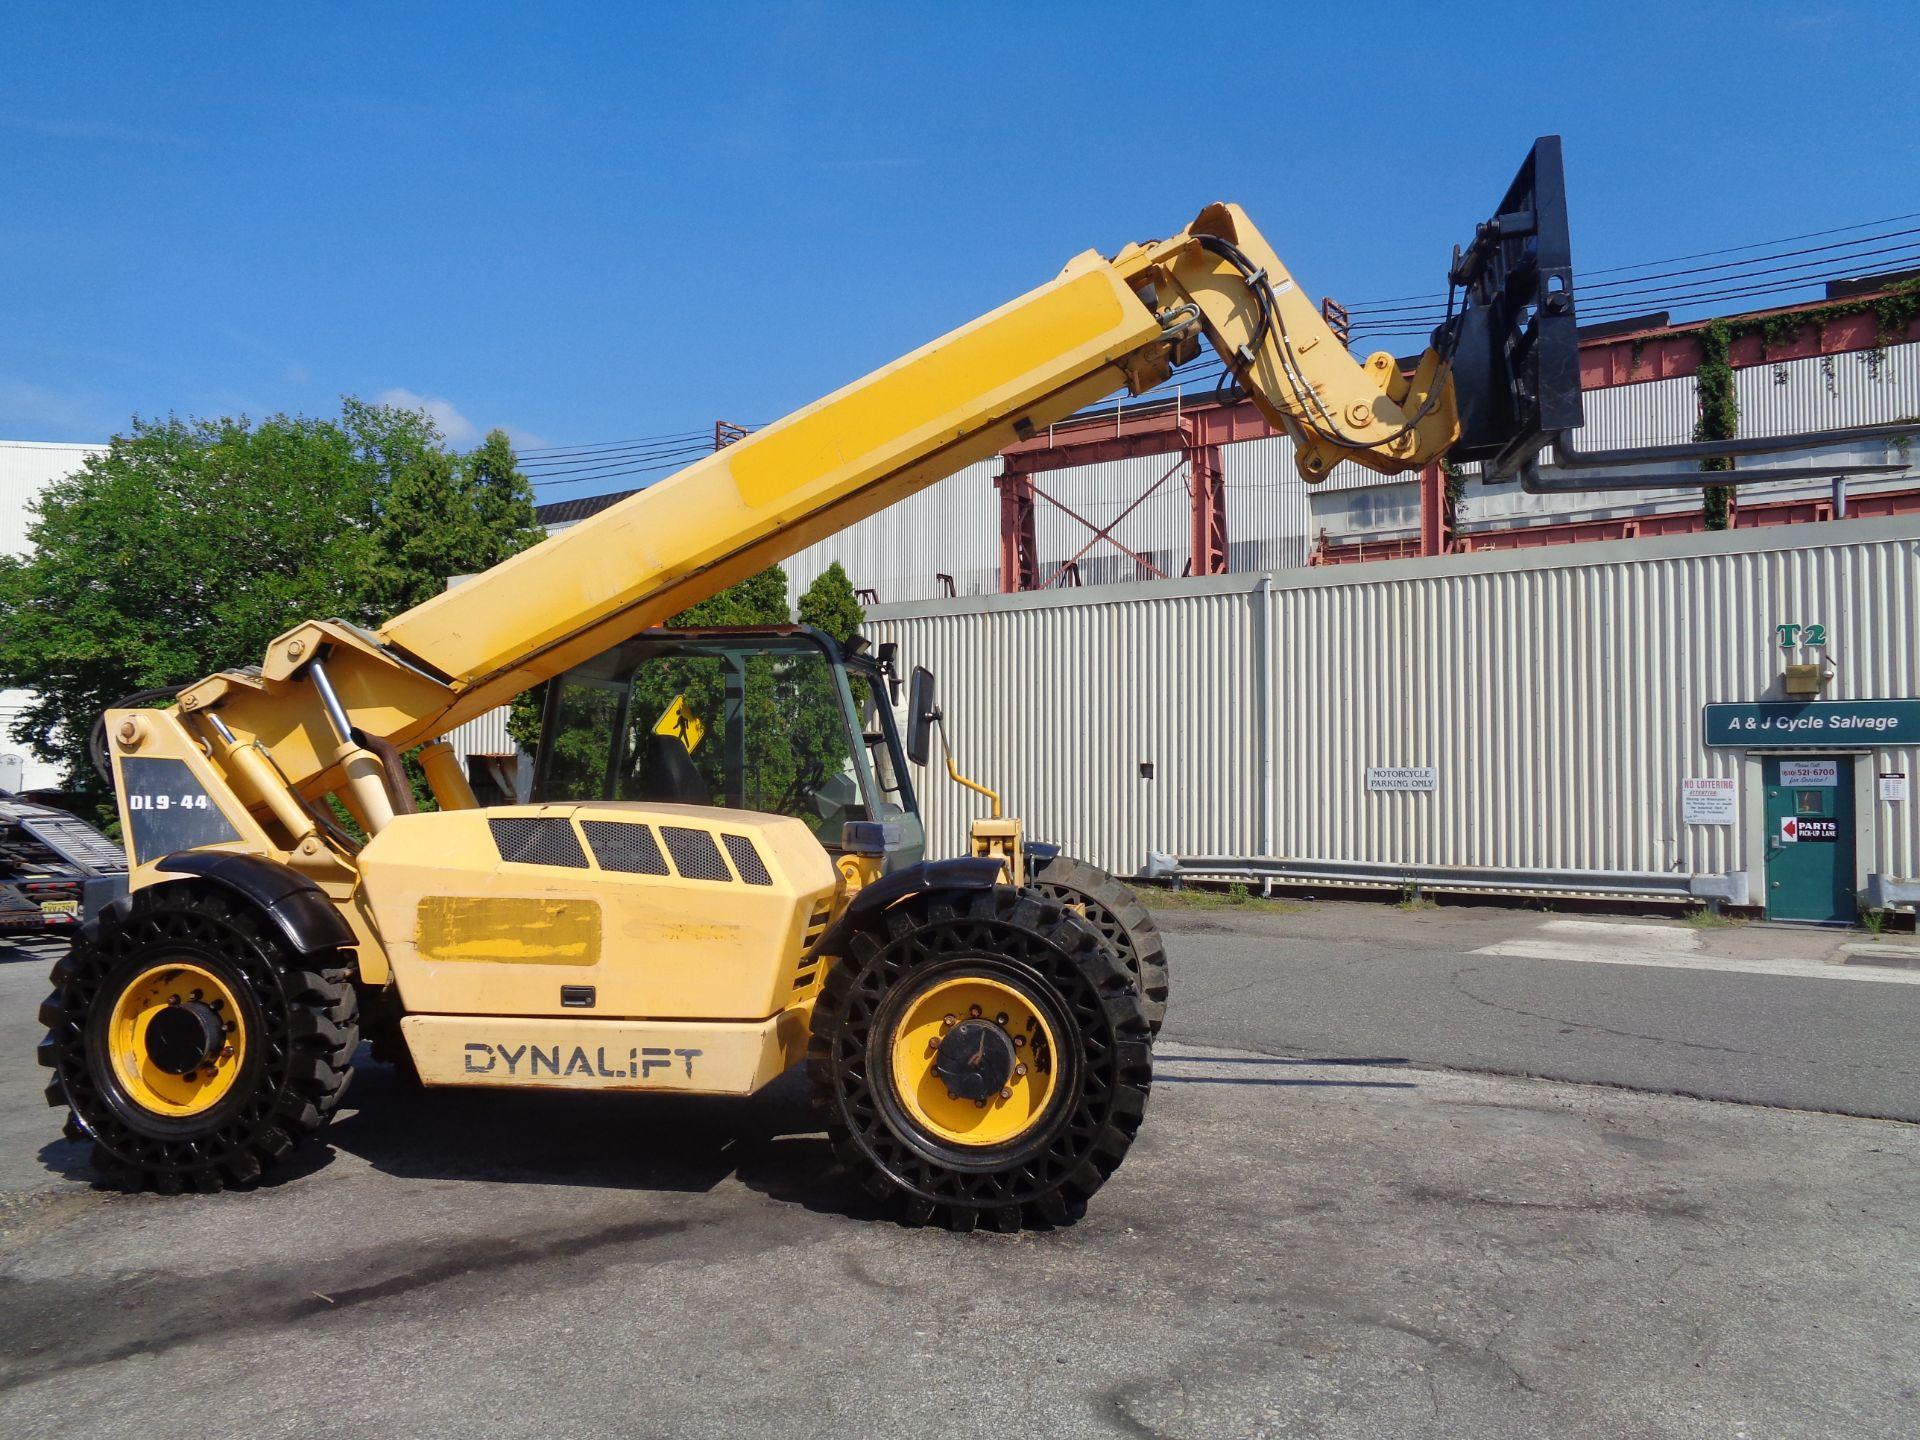 Lot 38 - 2012 Gehl DL944L 9,000lb Telescopic Forklift